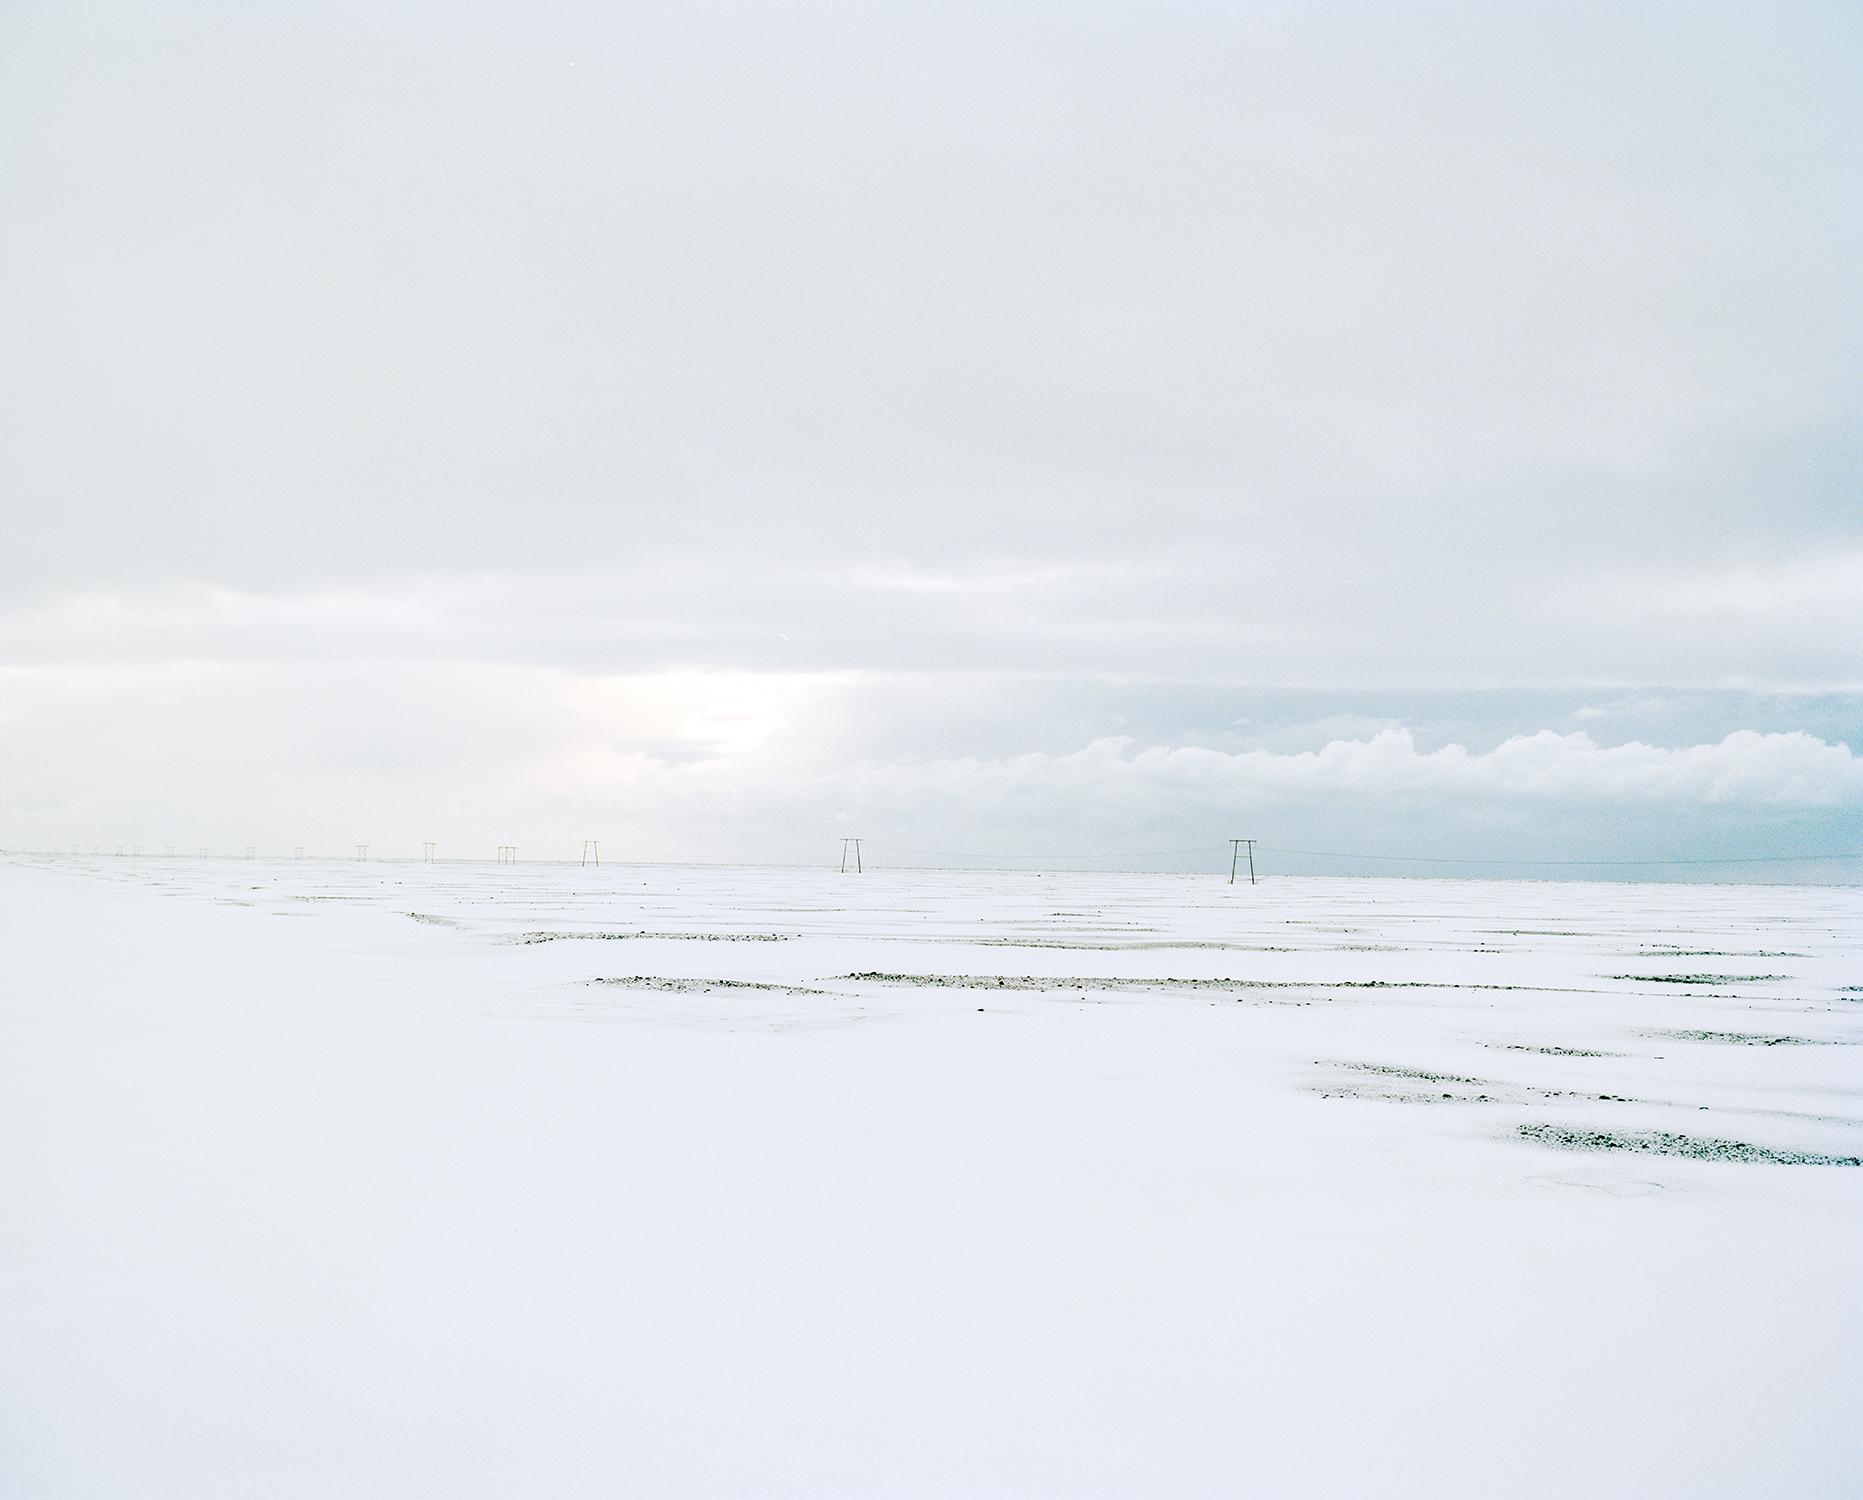 Iceland_001 032.jpg